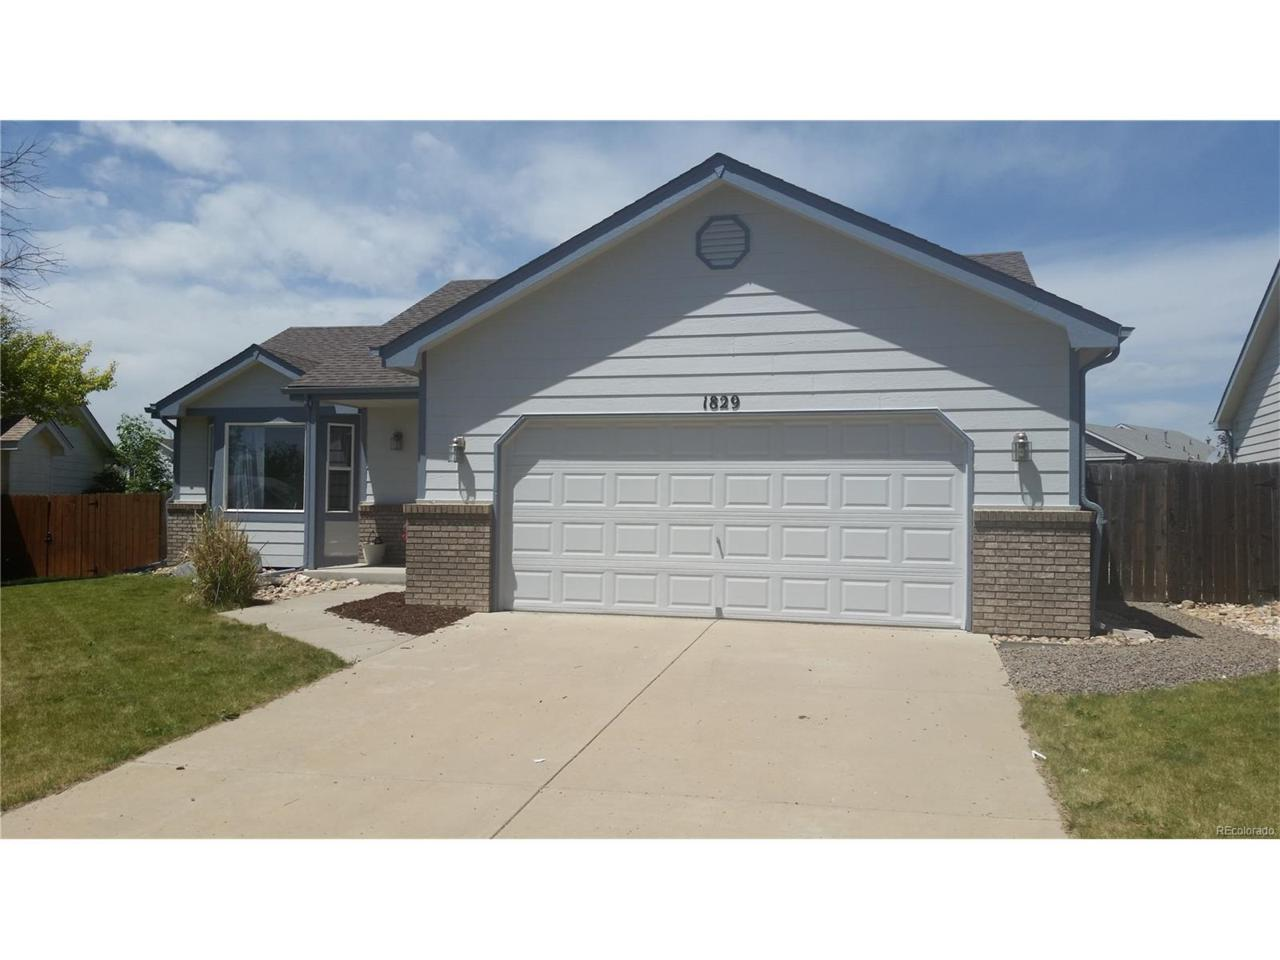 1829 Chesapeake Circle, Johnstown, CO 80534 (MLS #8660757) :: 8z Real Estate